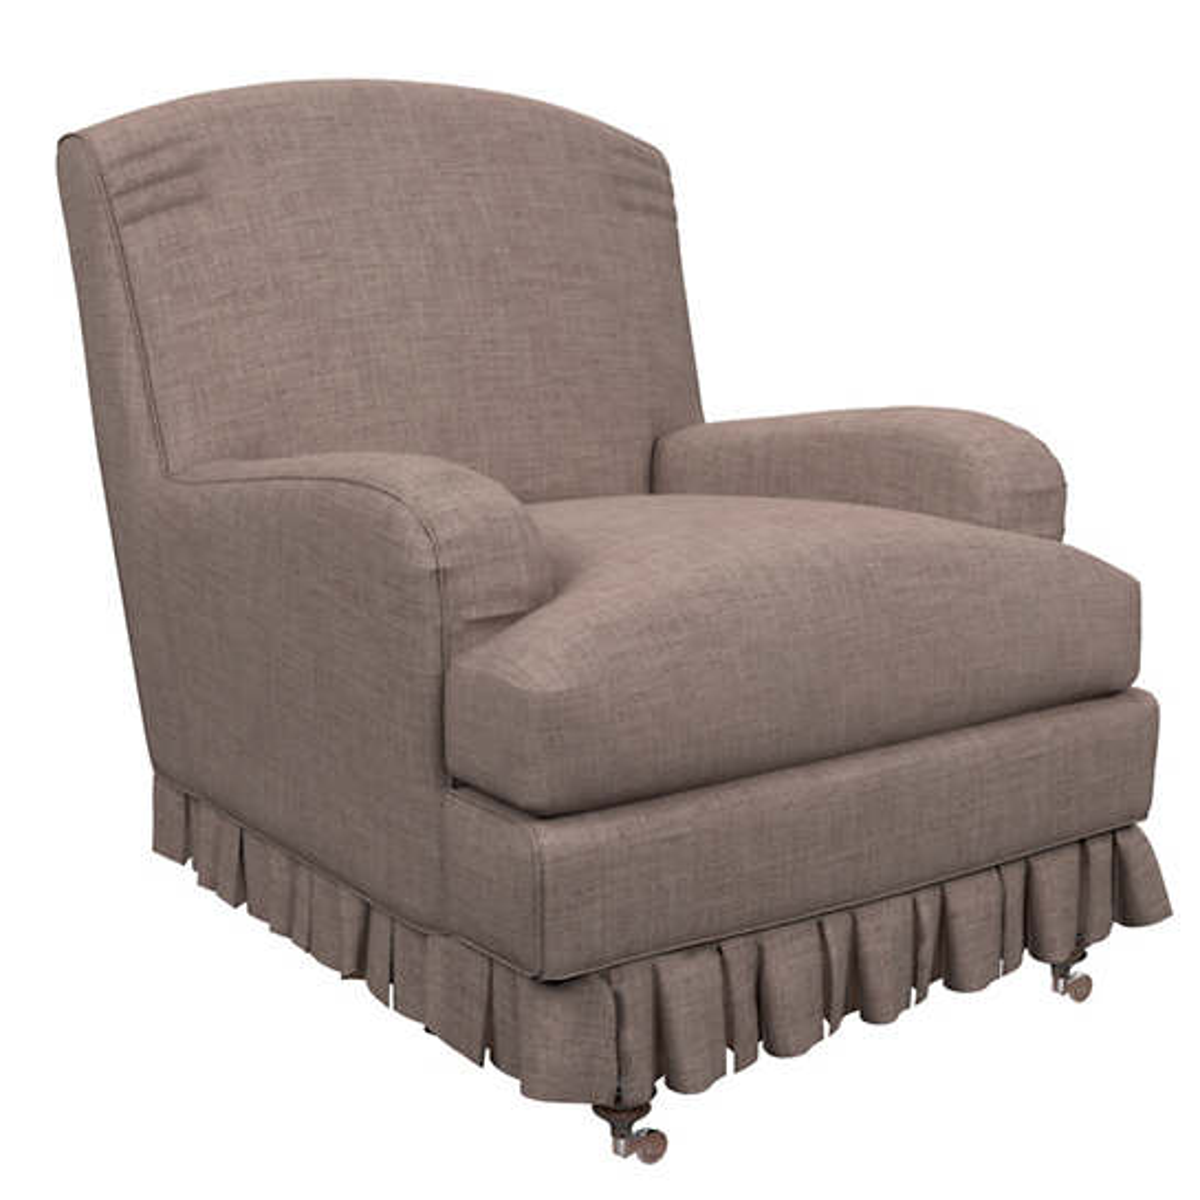 Canvasuede Heather Ellis Chair